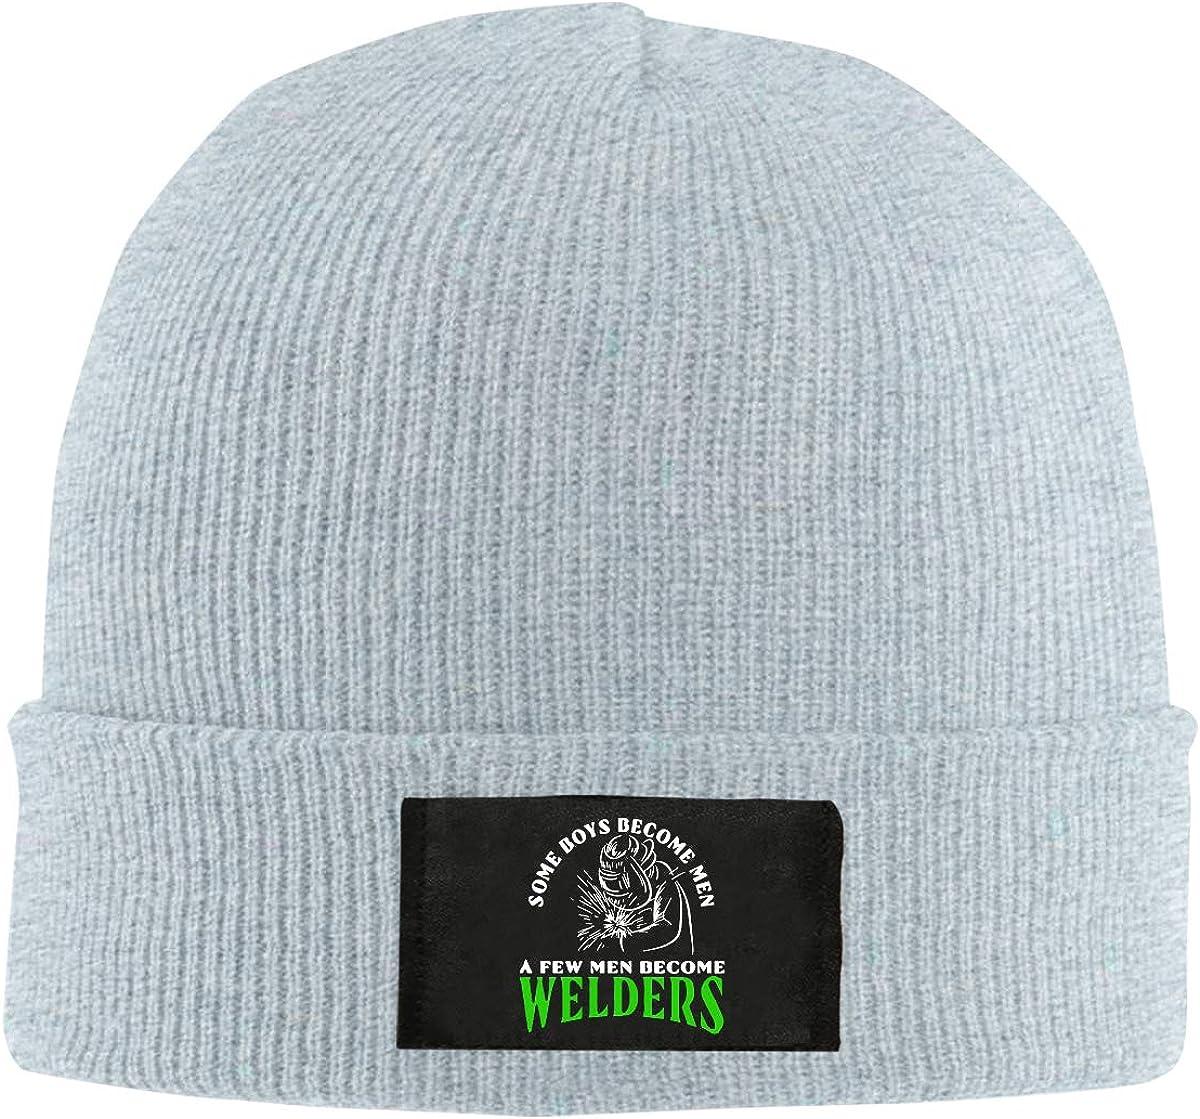 Some Boys Become Men Welder Skull Hat Beanie Cap Winter Knit Hat Cap Men Women Created Equal